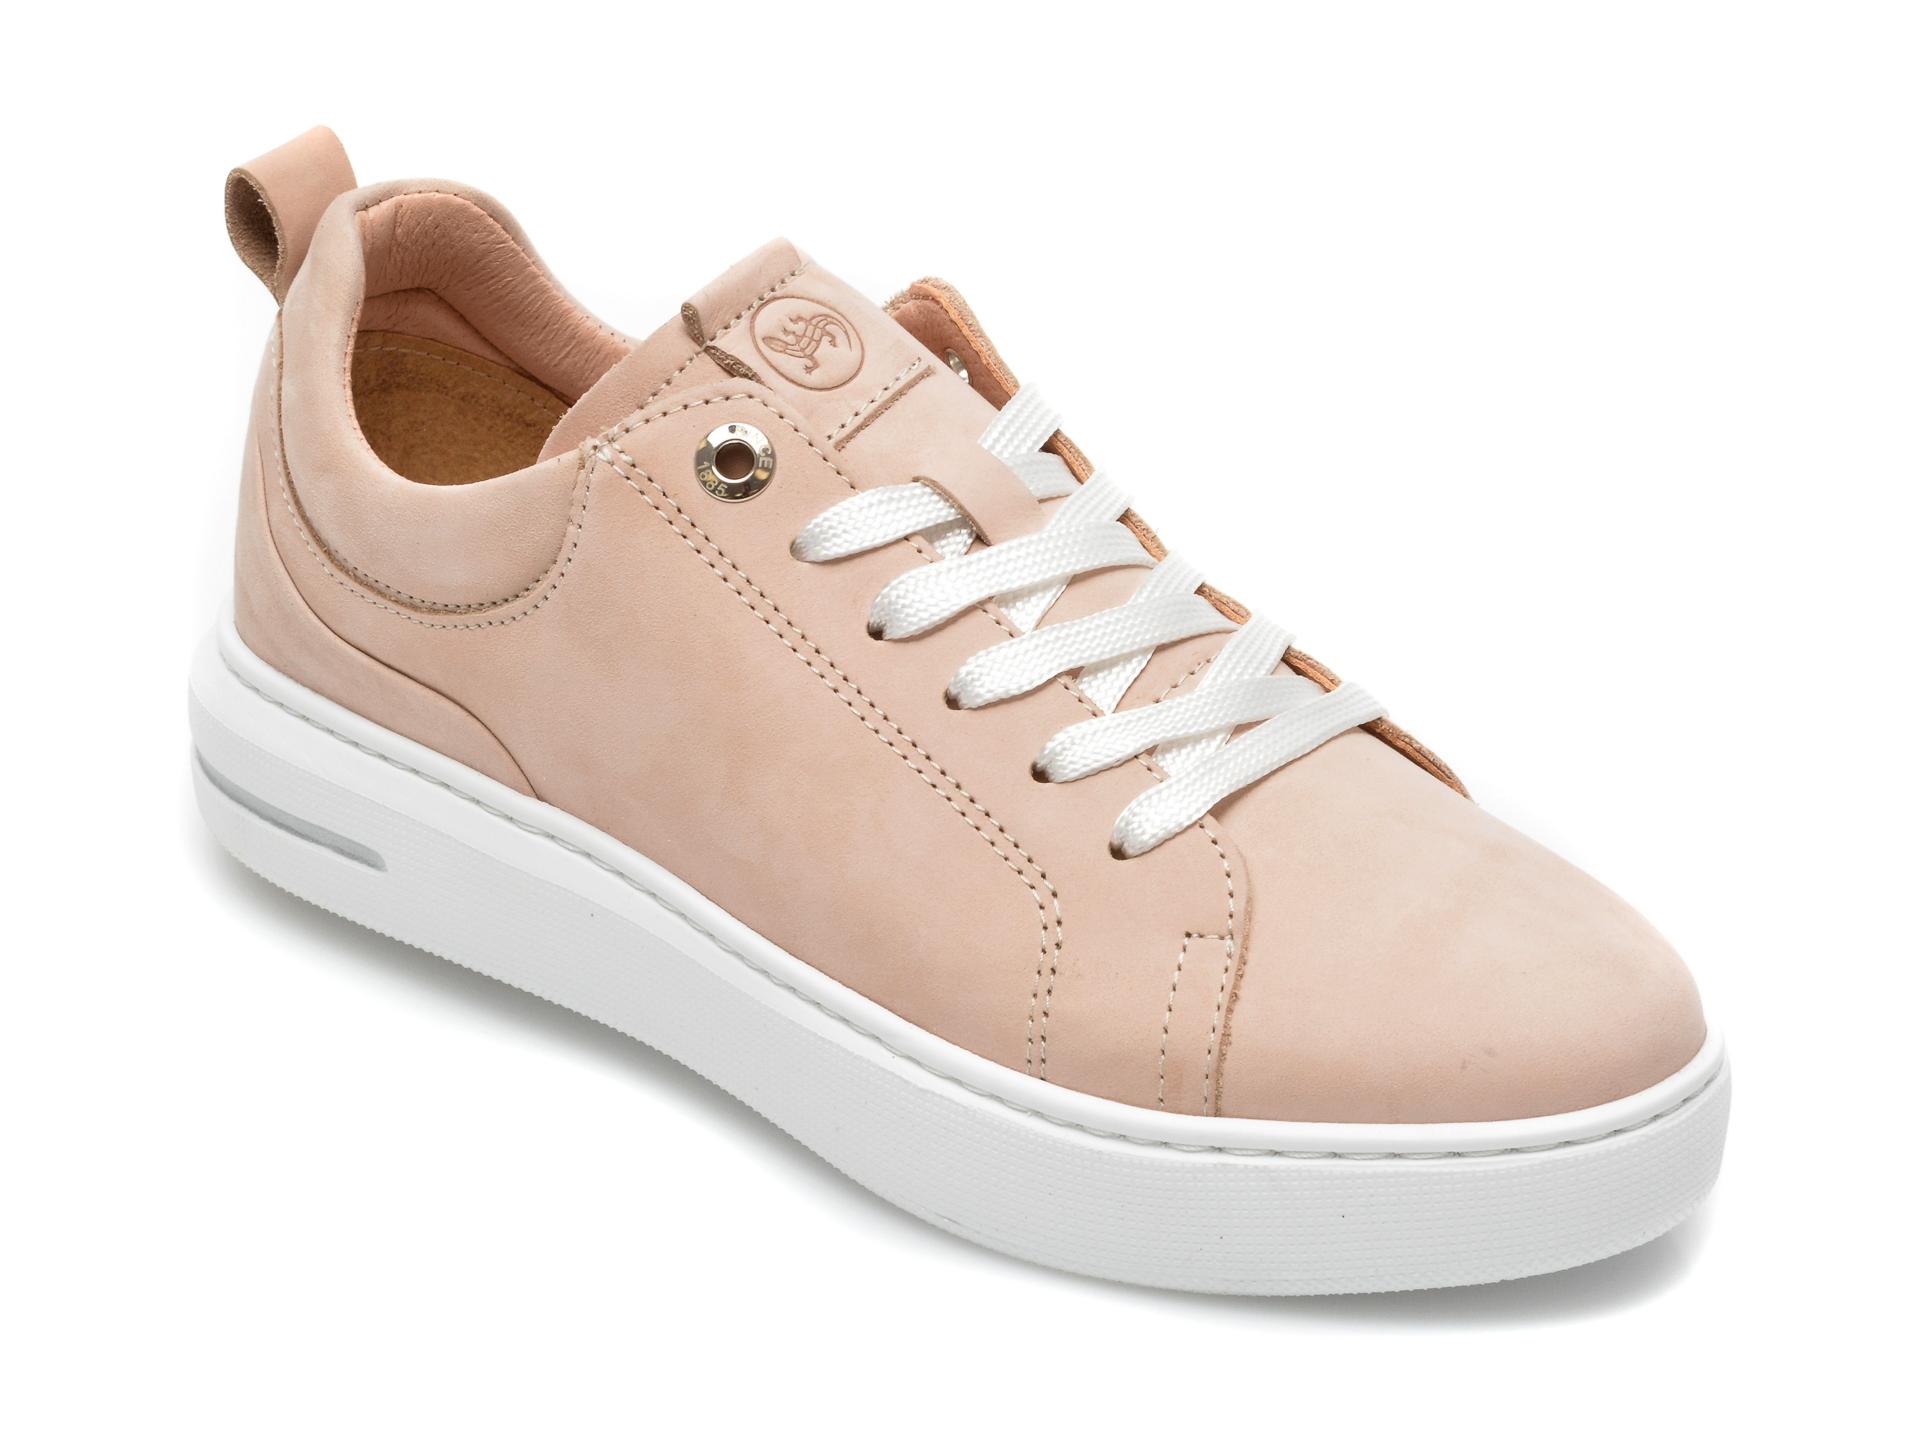 Pantofi sport SALAMANDER nude, 56902, din piele naturala imagine otter.ro 2021